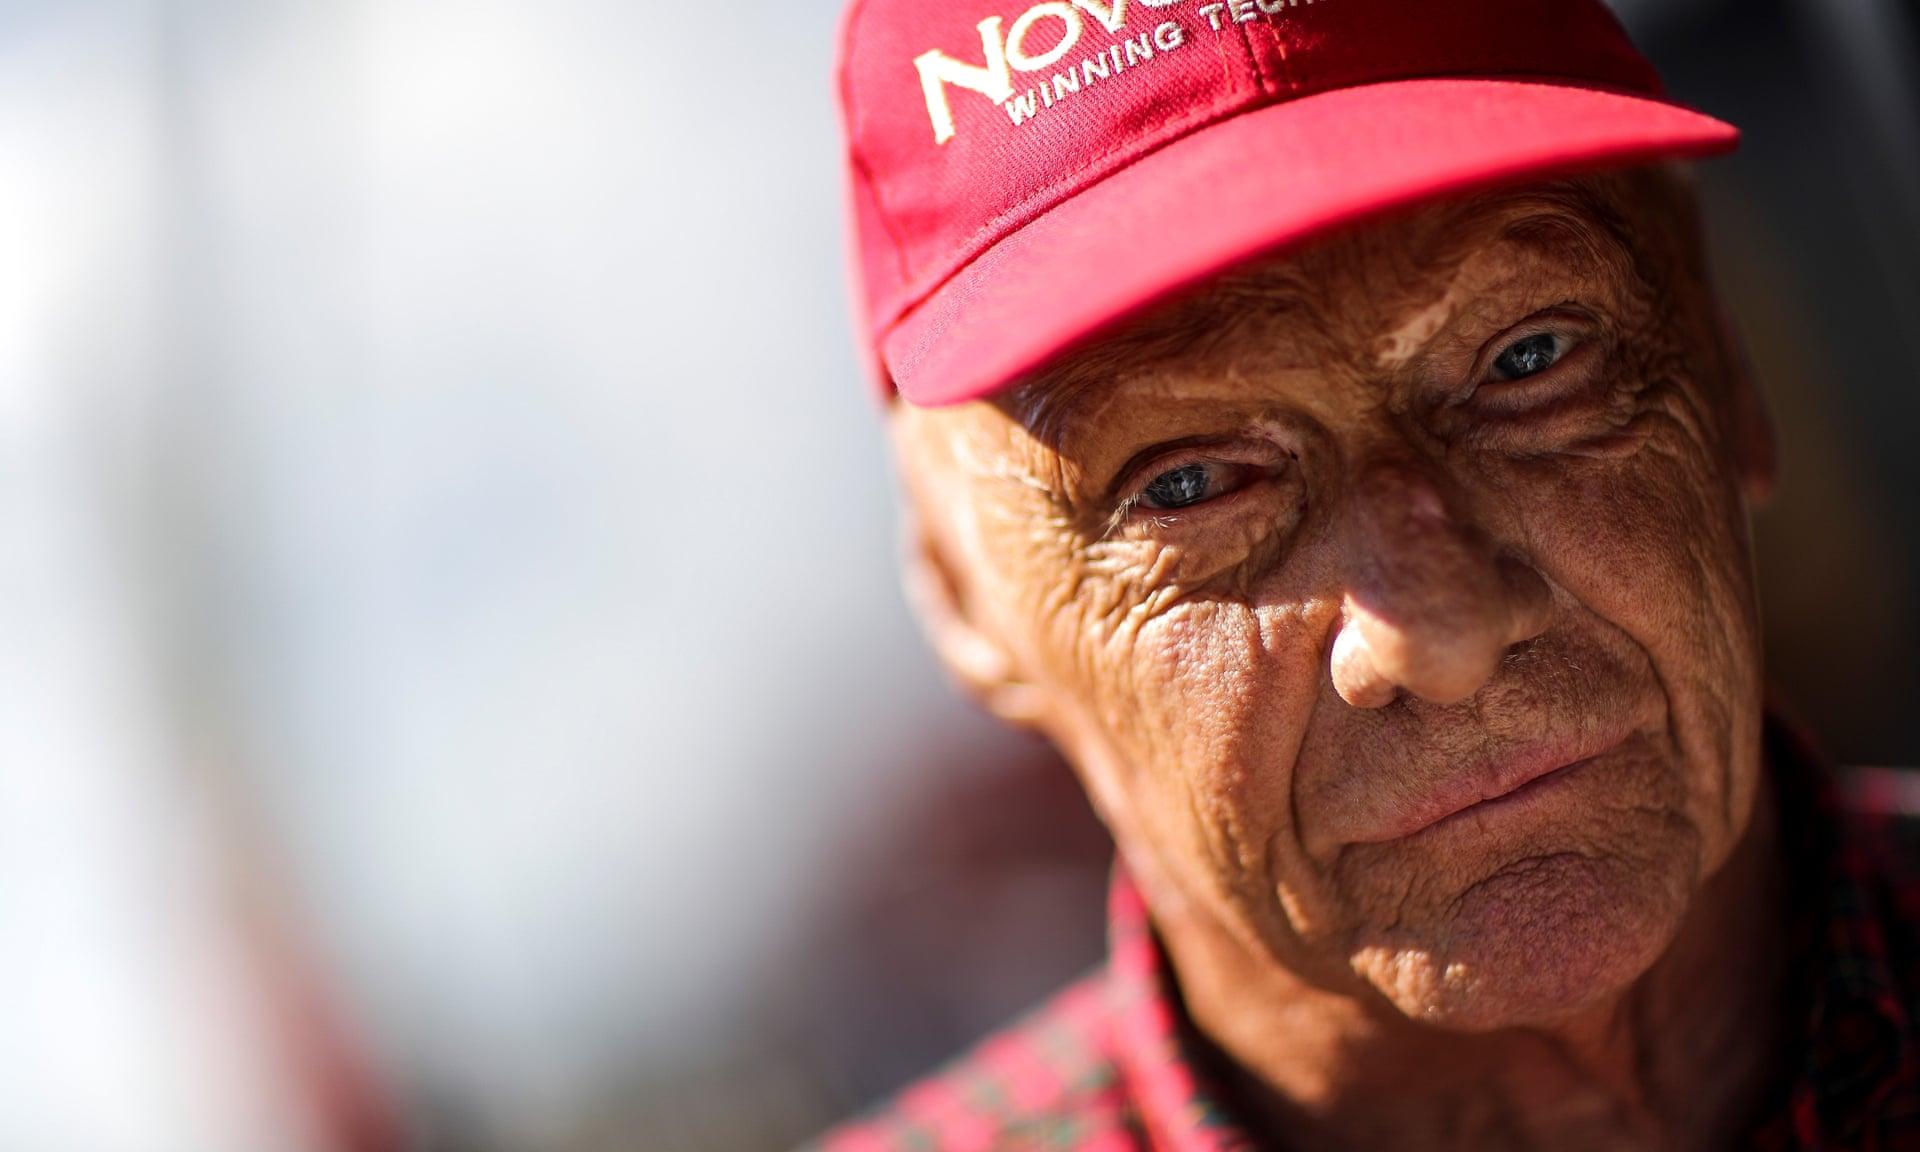 Three-time Formula 1 world champion Niki Lauda dies at 70